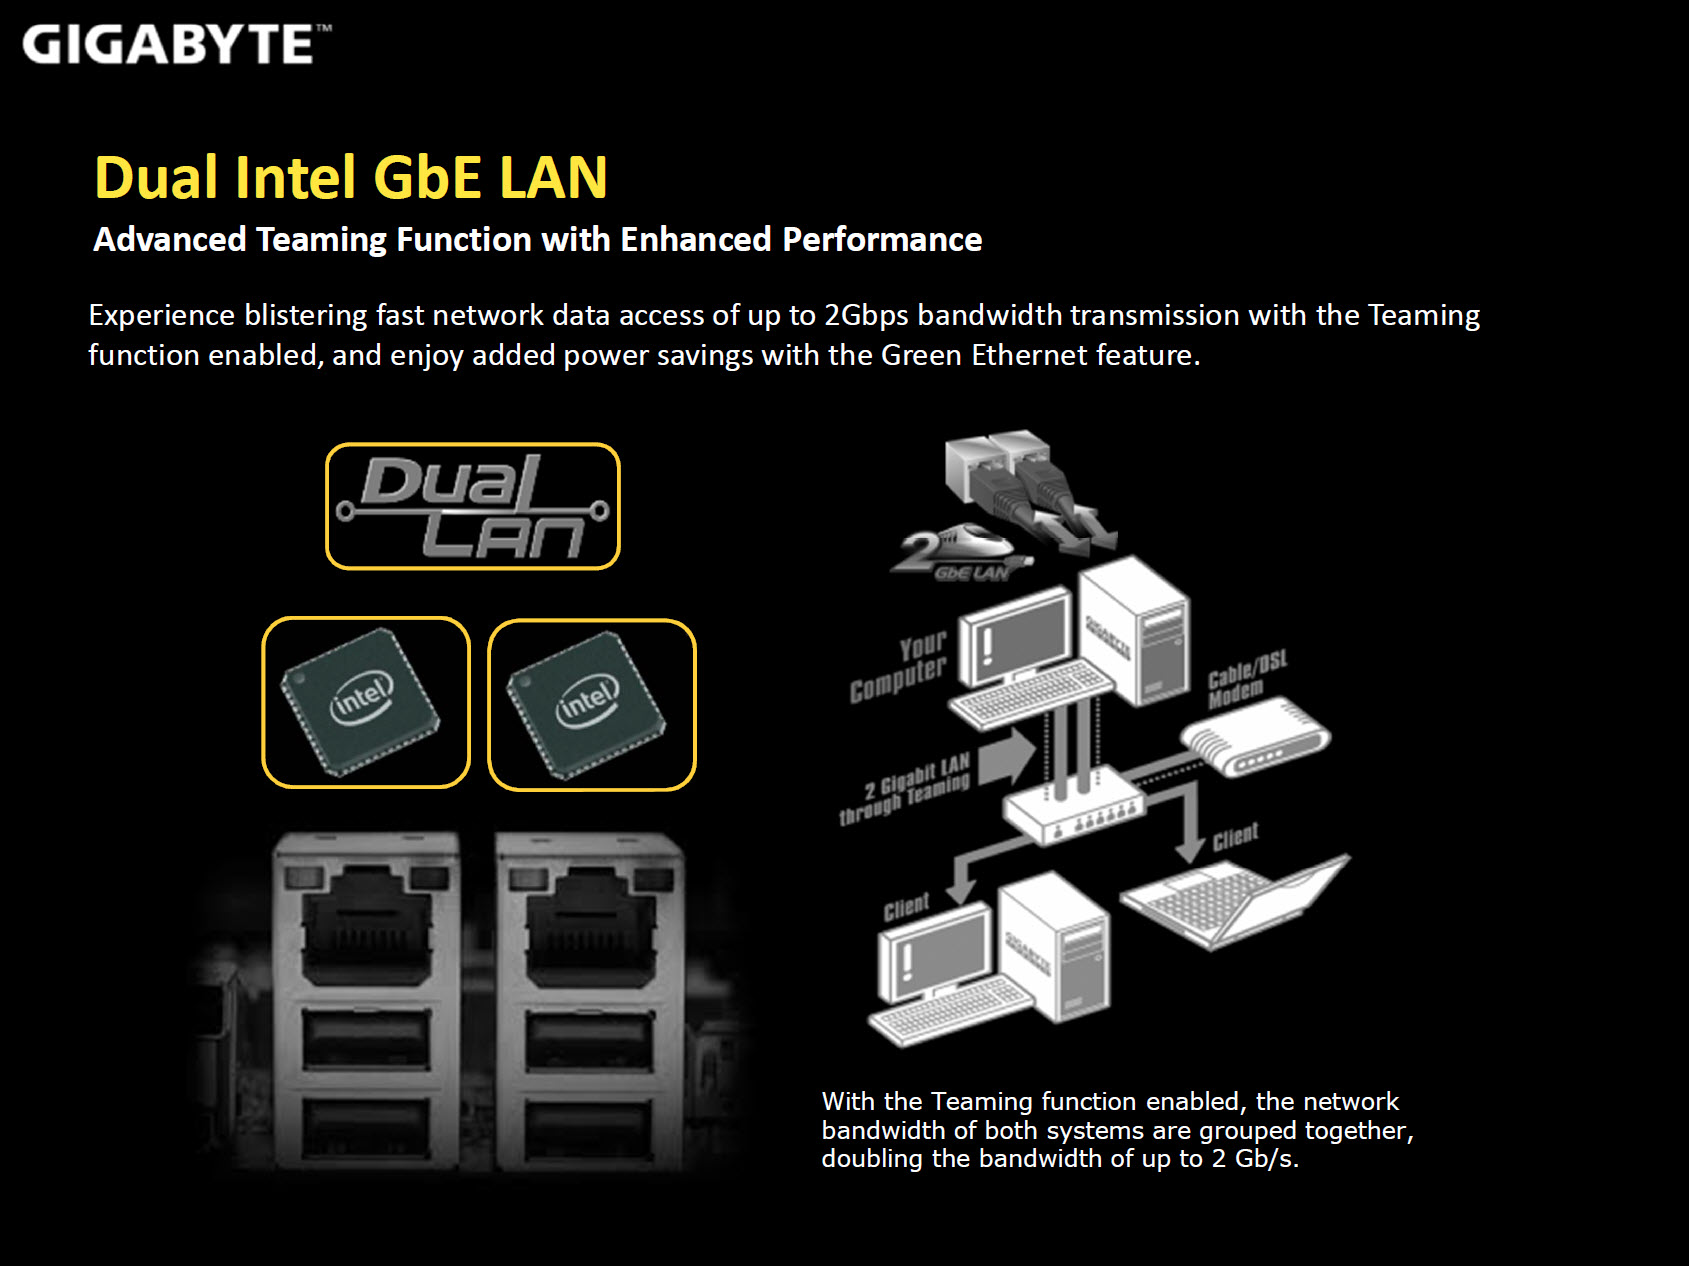 gigabyte-x99-ud7-wifi_dual-intel-gbe-lan